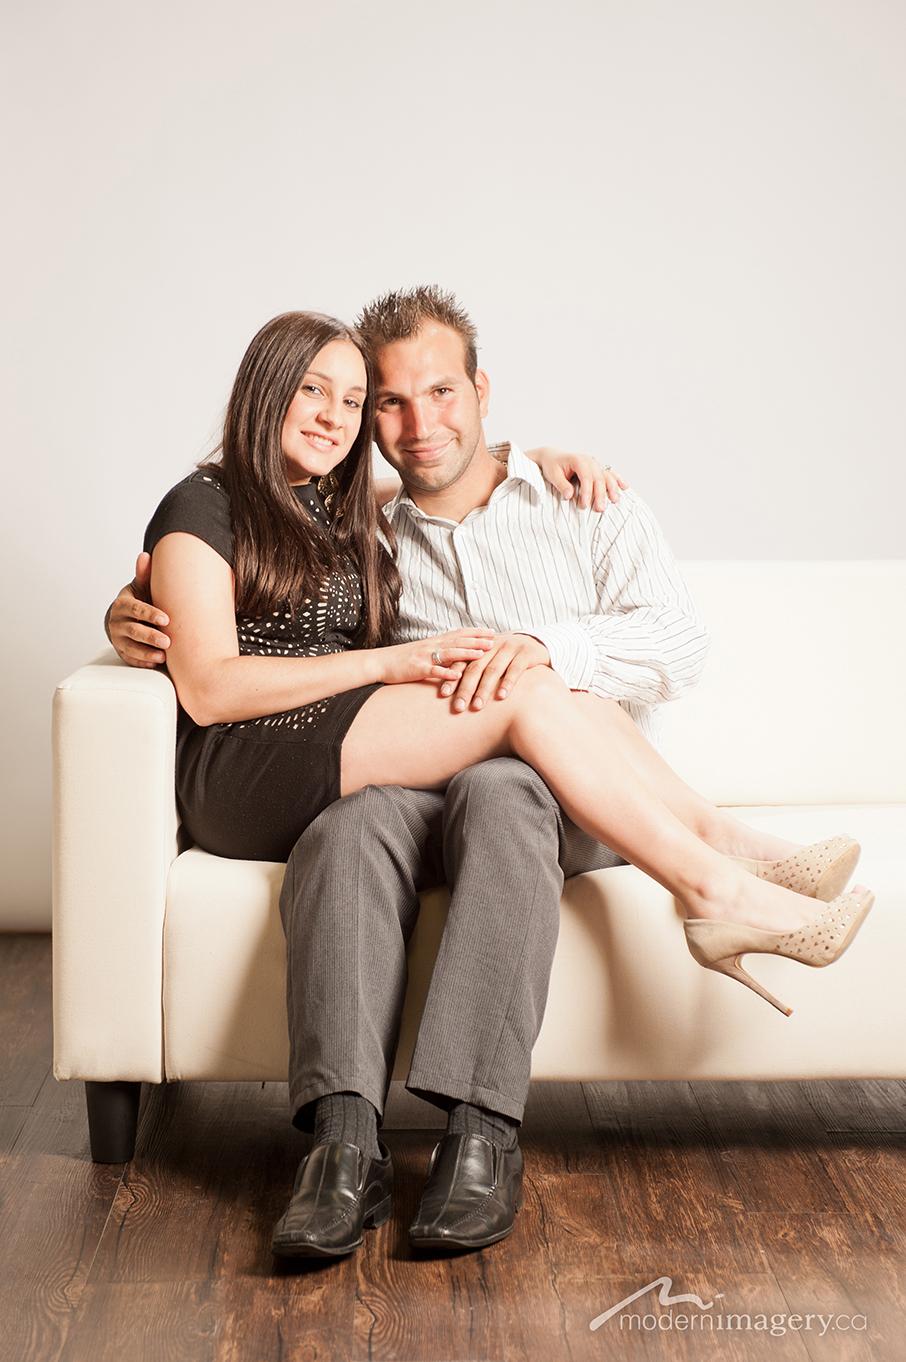 Rita&Tomasso-13.jpg